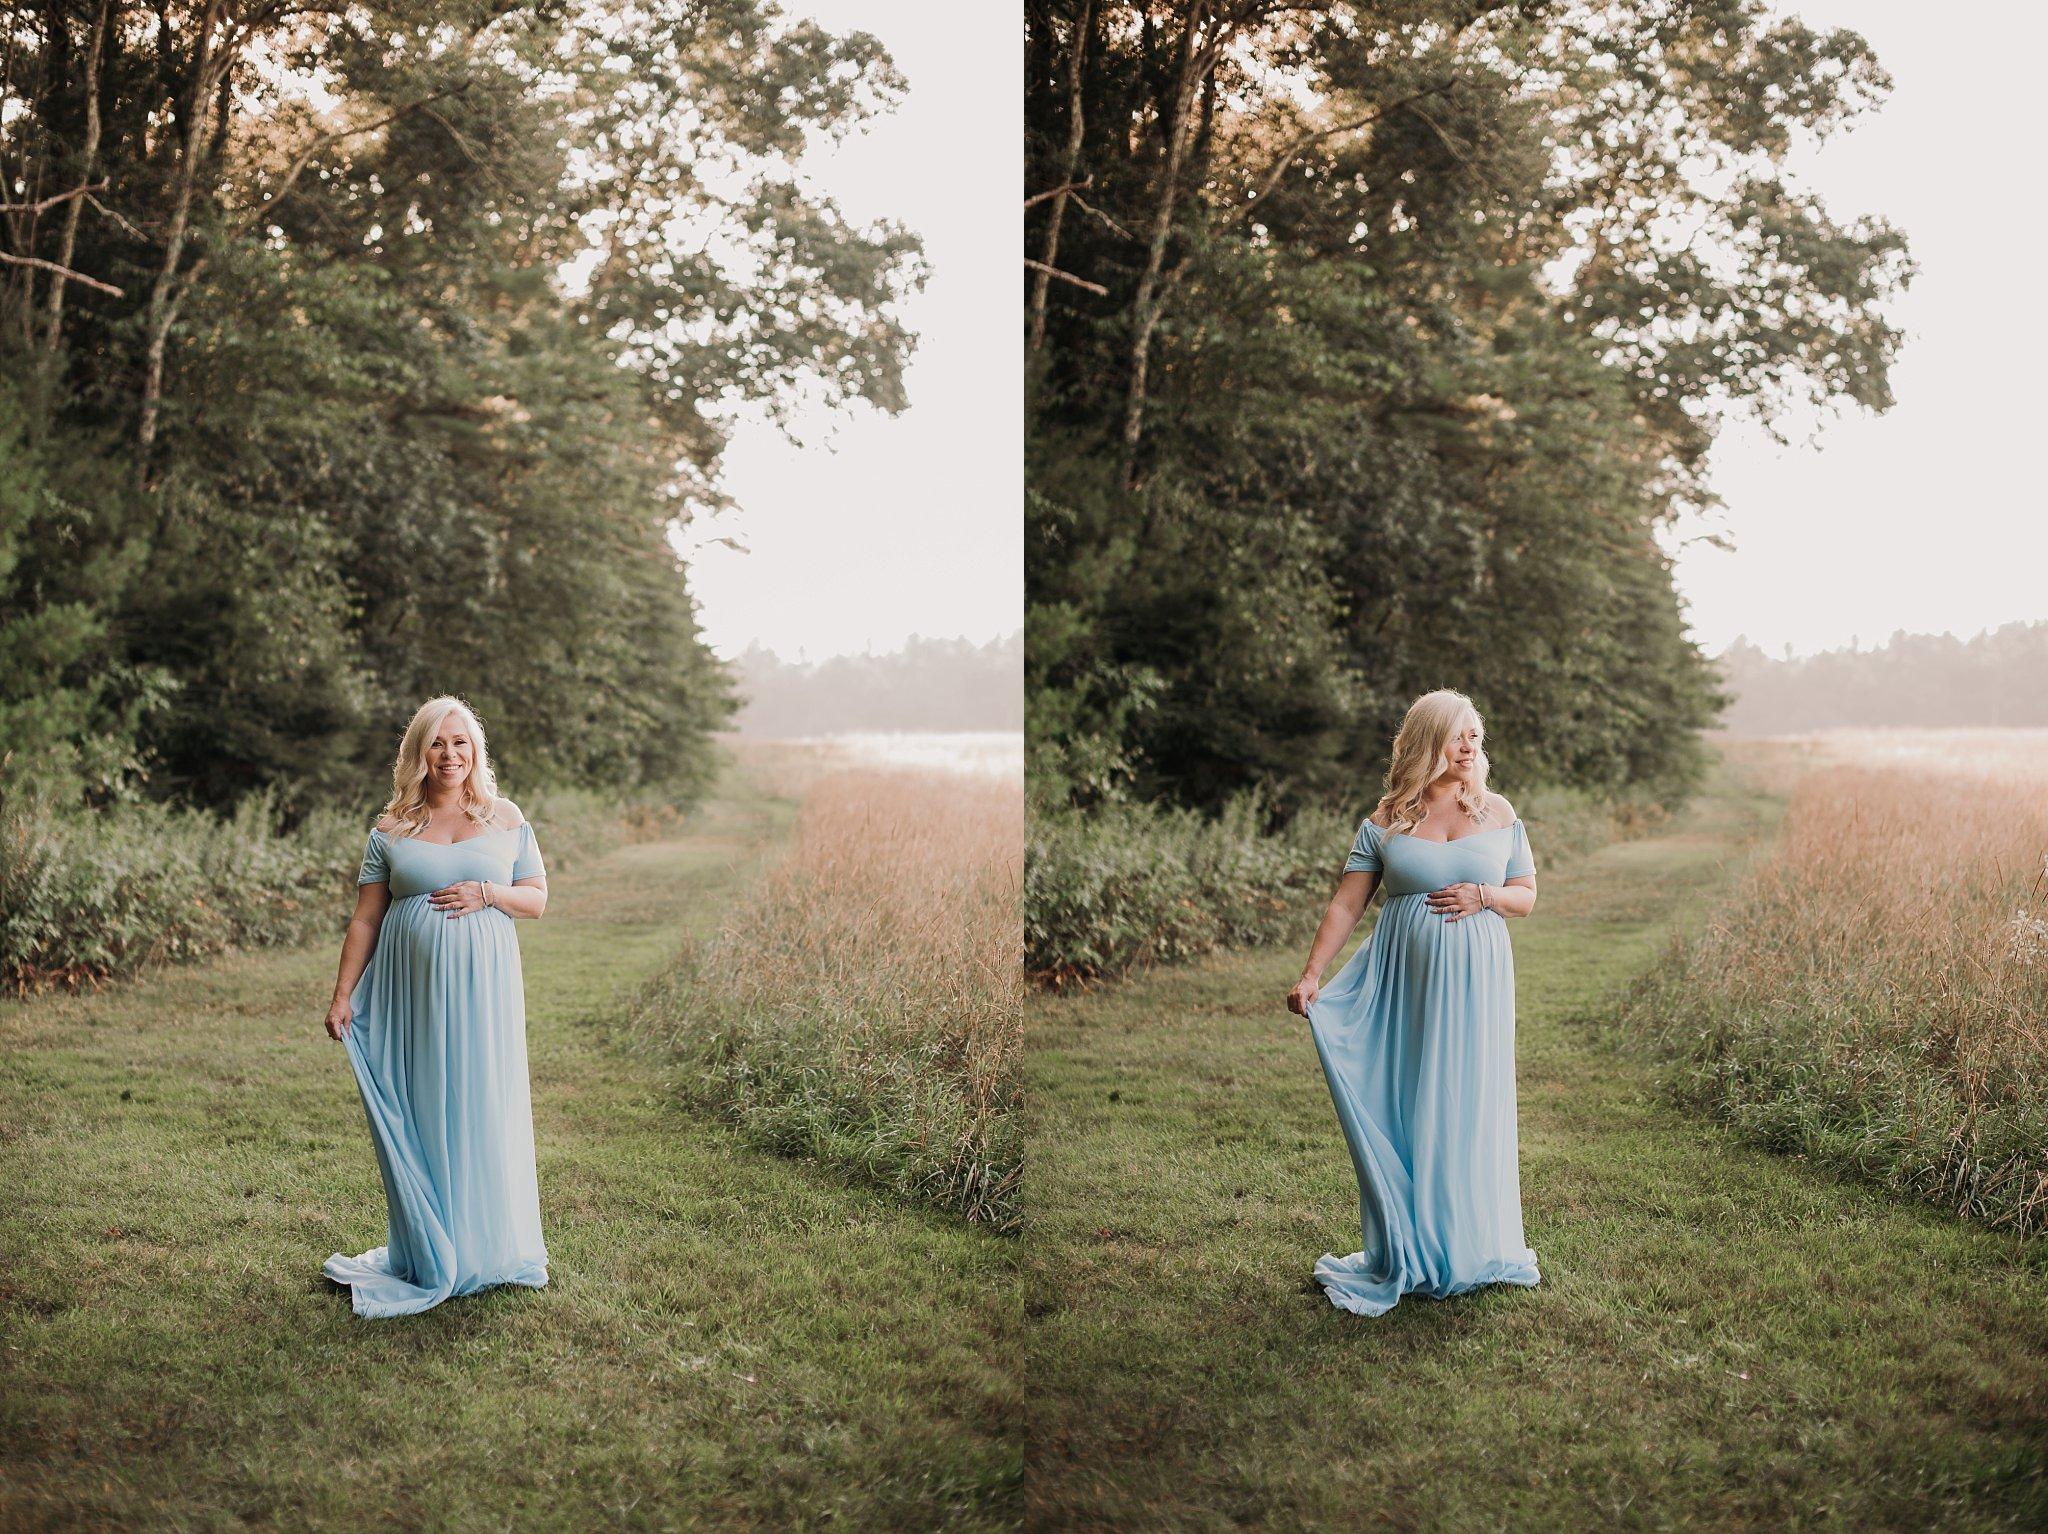 Beauty Maternity Portraits- Ria MacKenzie Photography-2.jpg